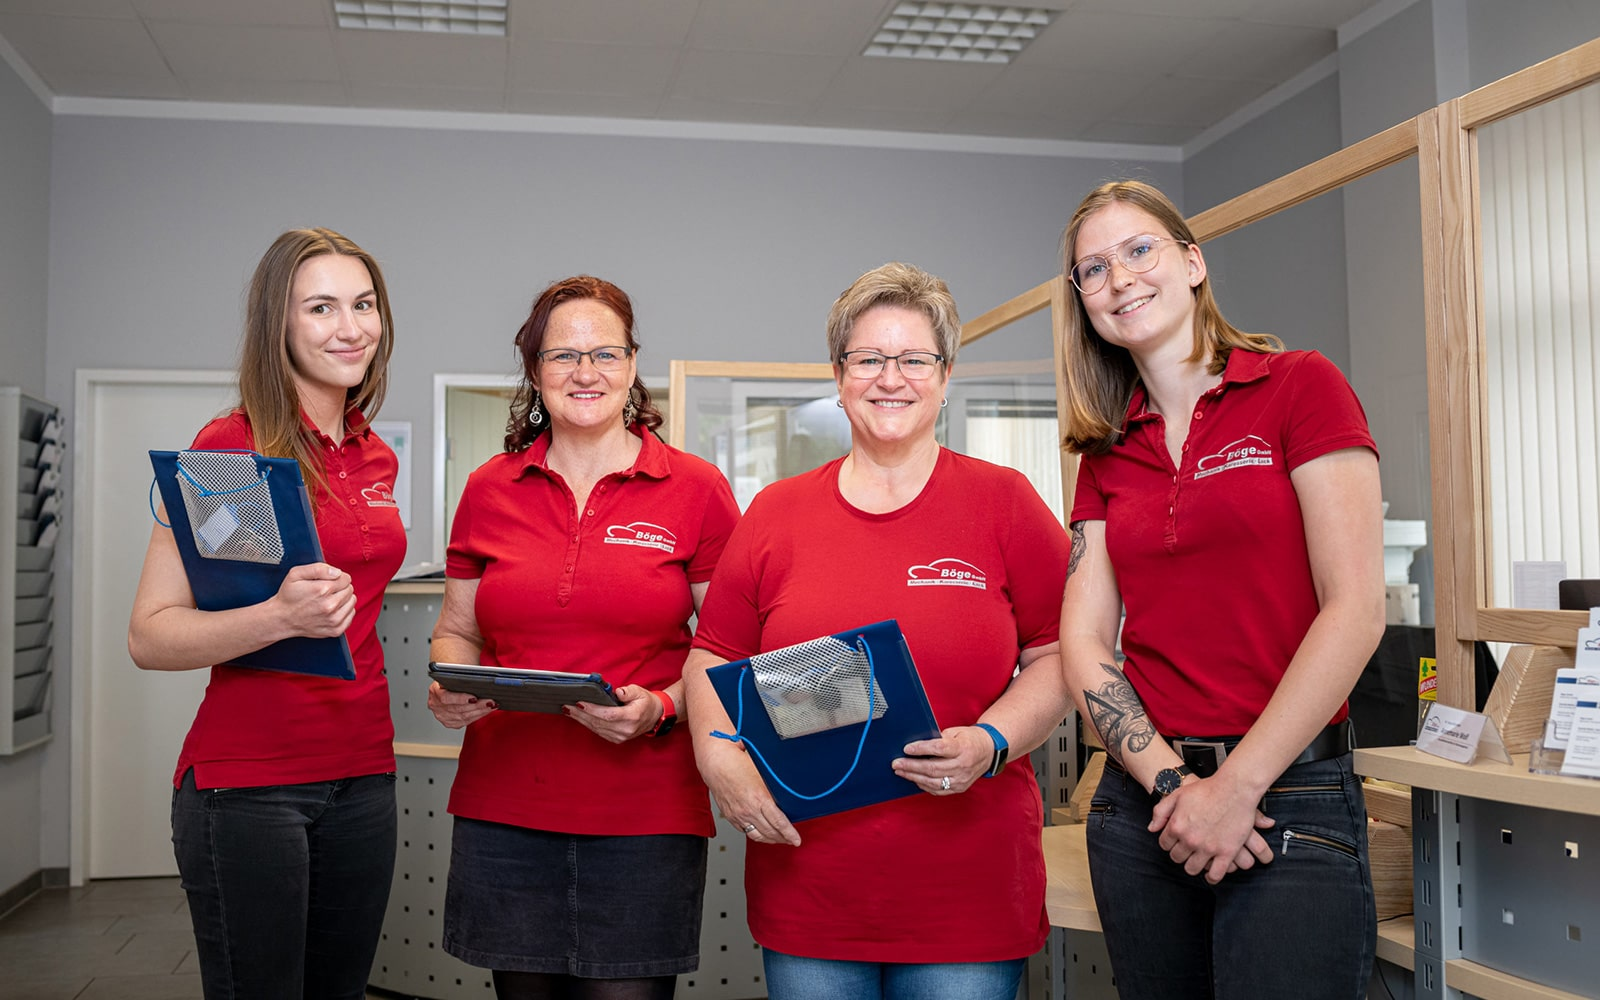 4 junge Frauen im Büro